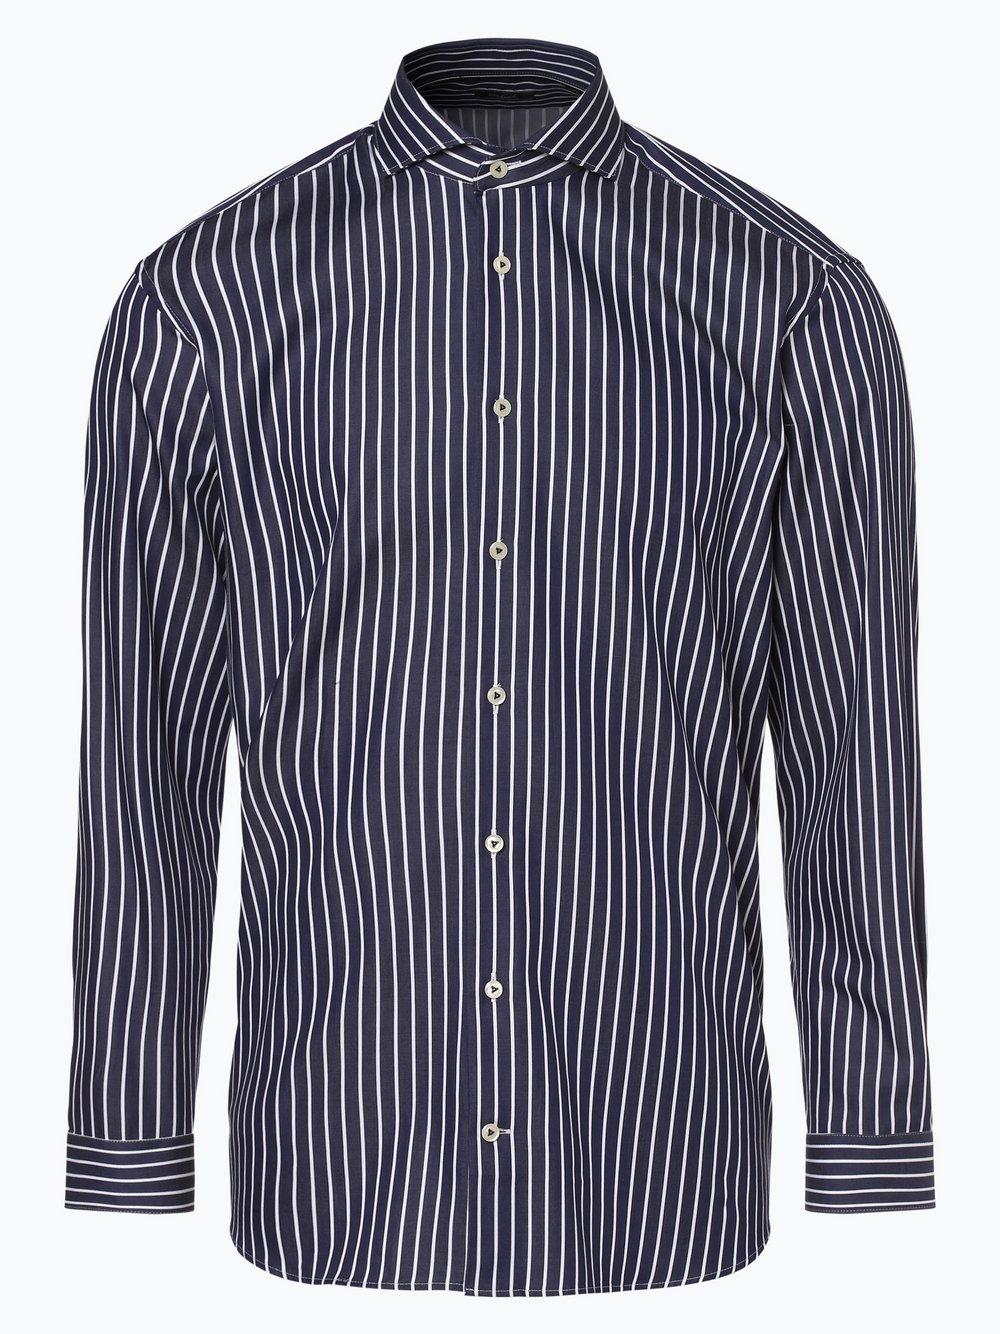 Van Laack – Koszula męska – Tailor fit, niebieski Van Graaf 444149-0001-00390